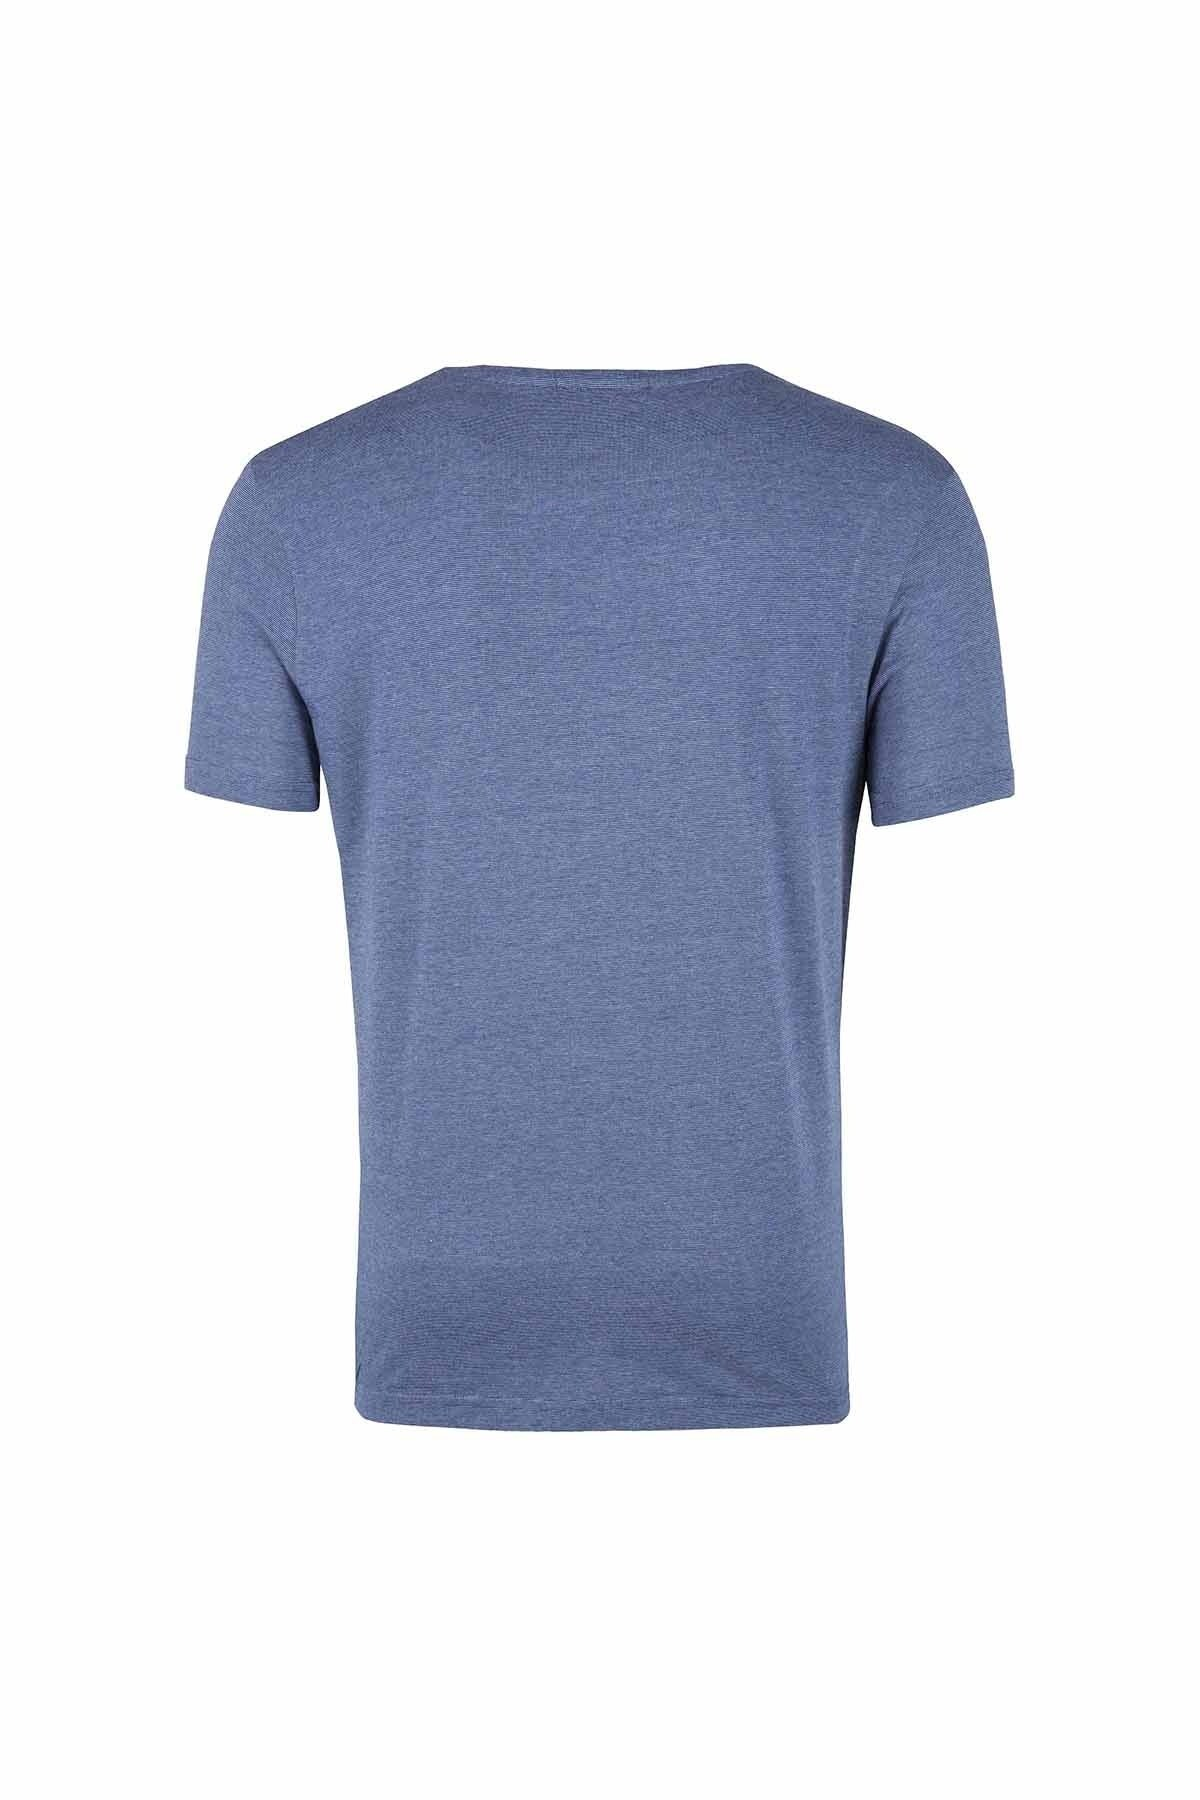 PIERRE BALMAIN T SHIRT Erkek T Shirt HP68226TA8292 730 İNDİGO